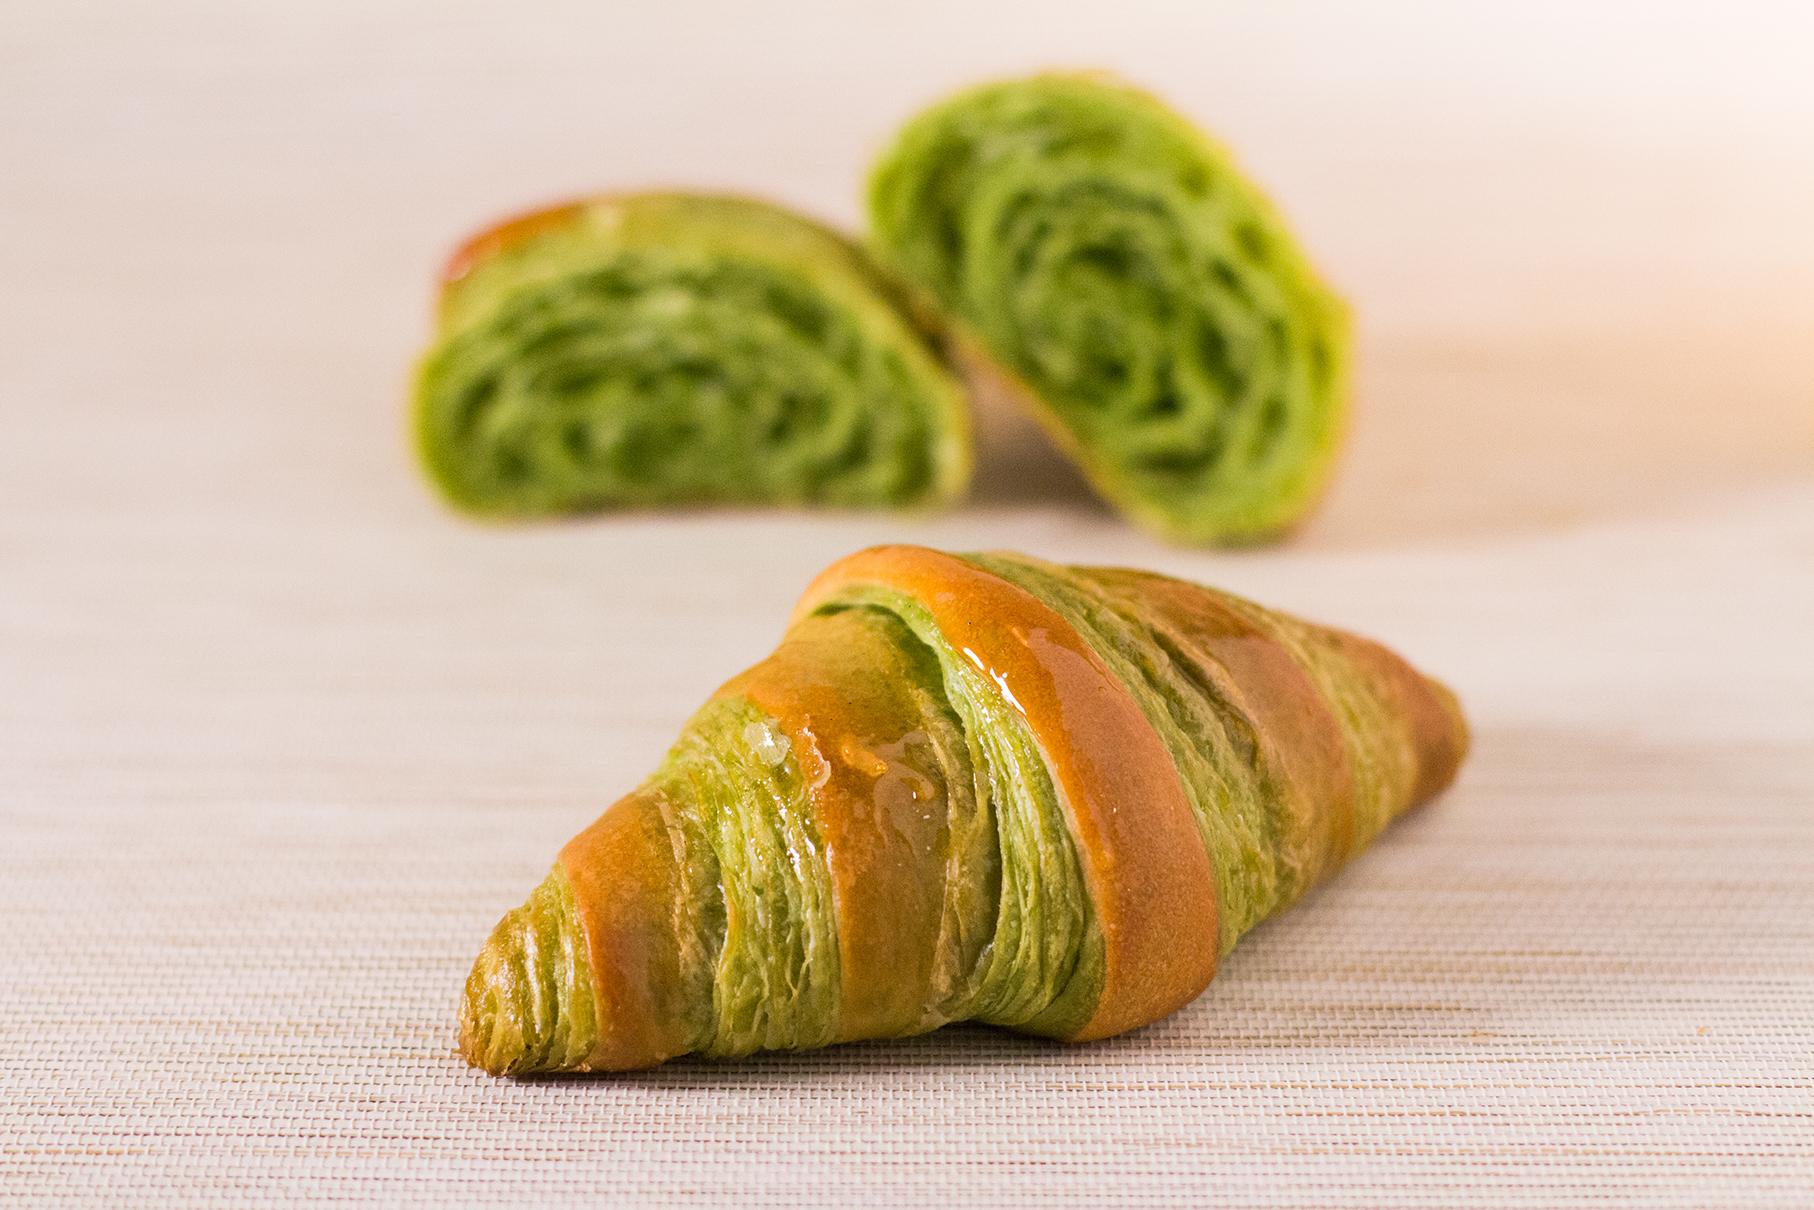 L'autentica pasticceria giapponese a milano, da Hiromi Cake